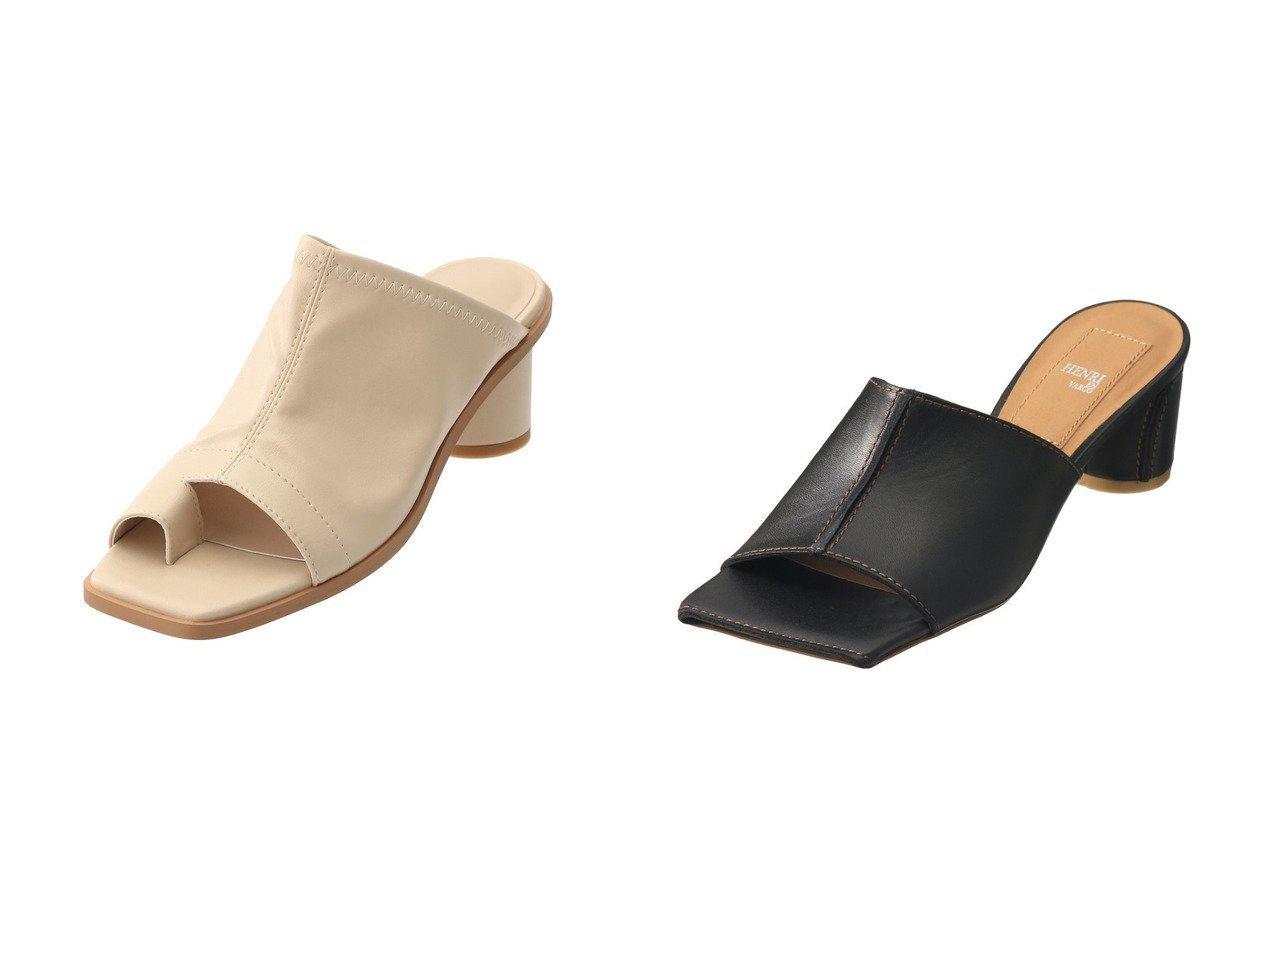 【HENRI EN VARGO/ヘンリ エン ヴァーゴ】のRola スクエアトゥミュール&【GALLARDAGALANTE/ガリャルダガランテ】のストレッチミュール 【シューズ・靴】おすすめ!人気、トレンド・レディースファッションの通販  おすすめで人気の流行・トレンド、ファッションの通販商品 メンズファッション・キッズファッション・インテリア・家具・レディースファッション・服の通販 founy(ファニー) https://founy.com/ ファッション Fashion レディースファッション WOMEN 2021年 2021 2021春夏・S/S SS/Spring/Summer/2021 S/S・春夏 SS・Spring/Summer ストレッチ トレンド ミュール 春 Spring  ID:crp329100000026780